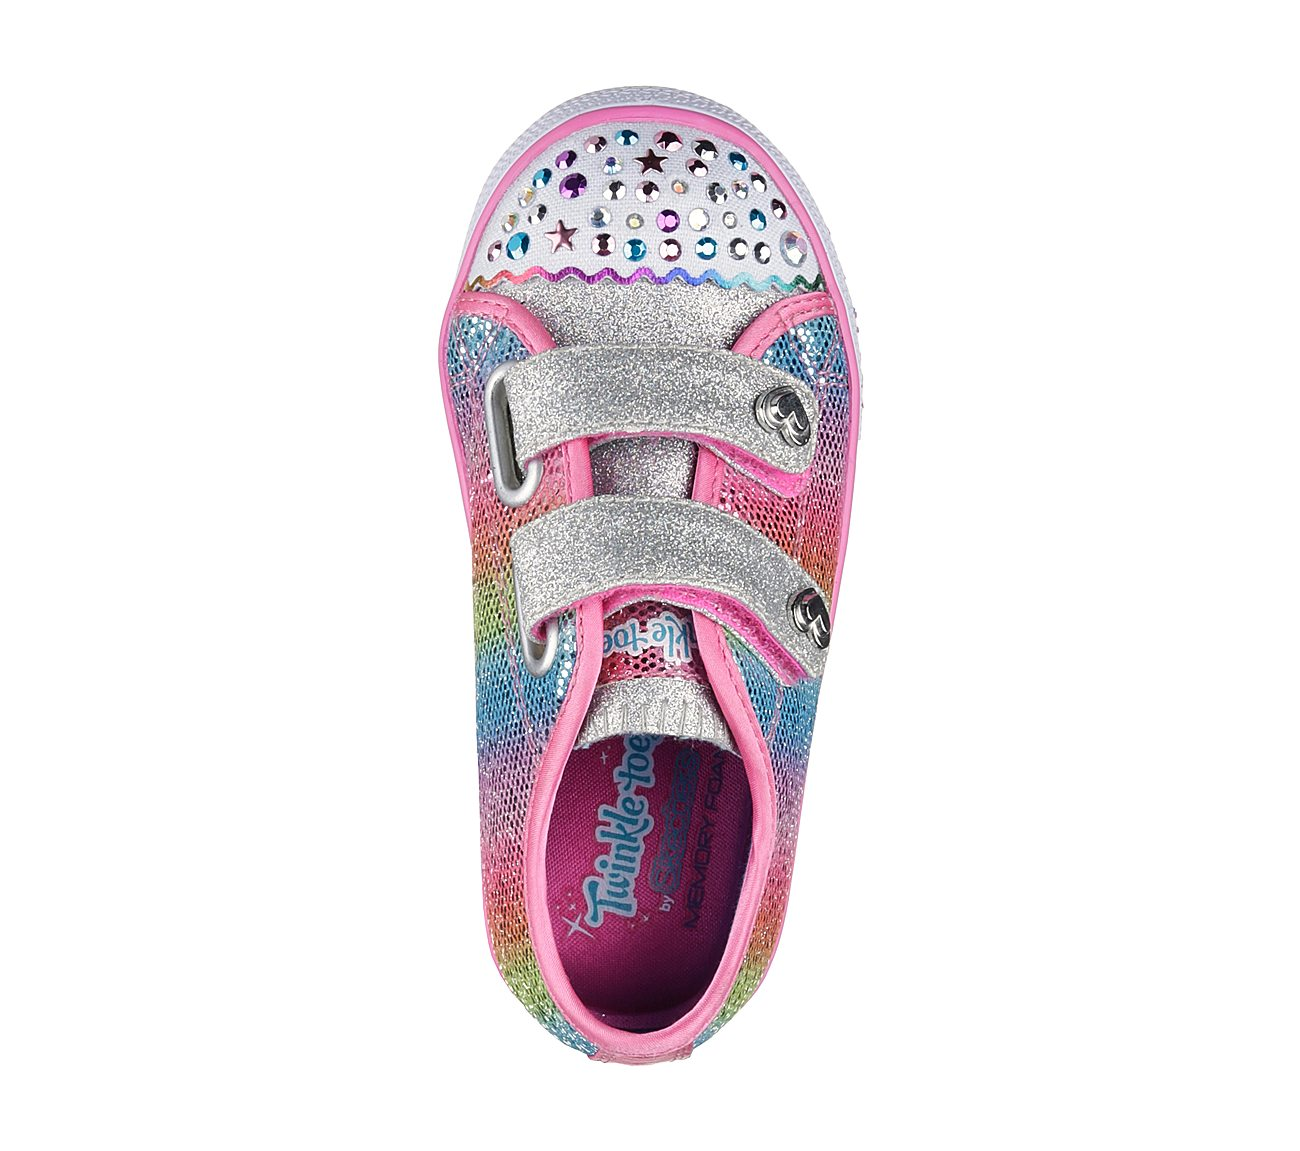 Step Up Sparkle Kicks Multi J43 New Girl Toddler Skechers 10696N Twinkle Toes